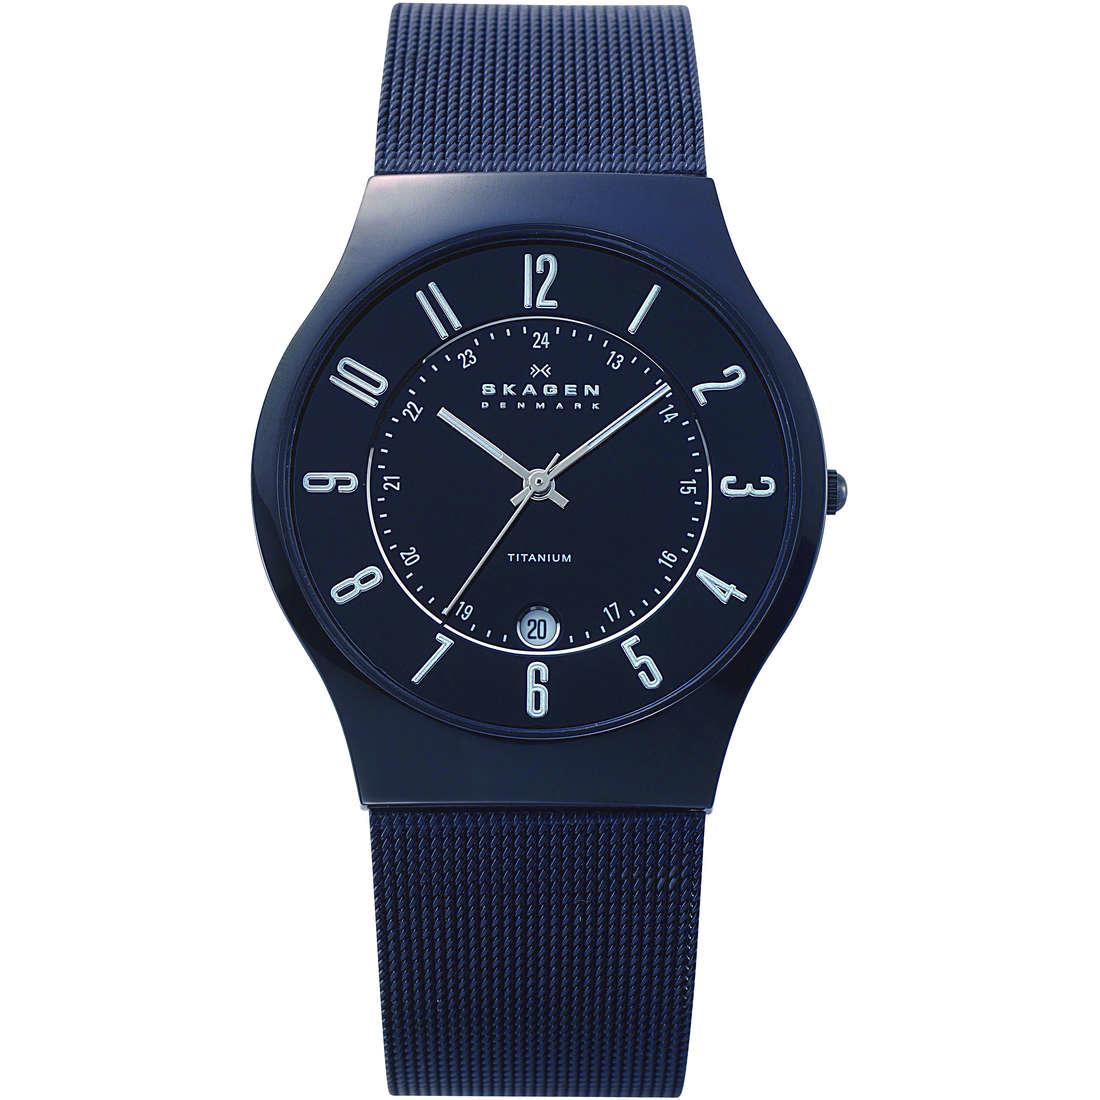 orologio solo tempo uomo Skagen 233XLTMB